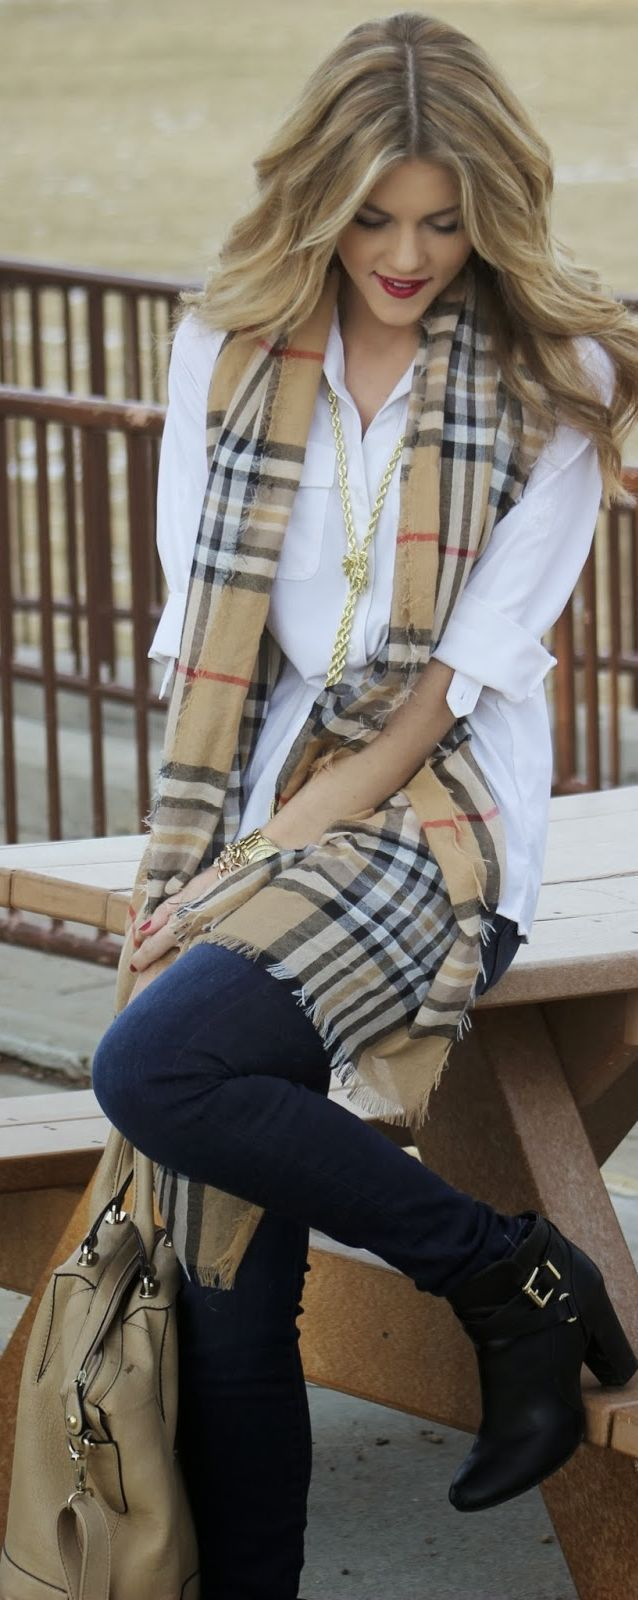 best trip sep images on pinterest cashmere scarf pashmina